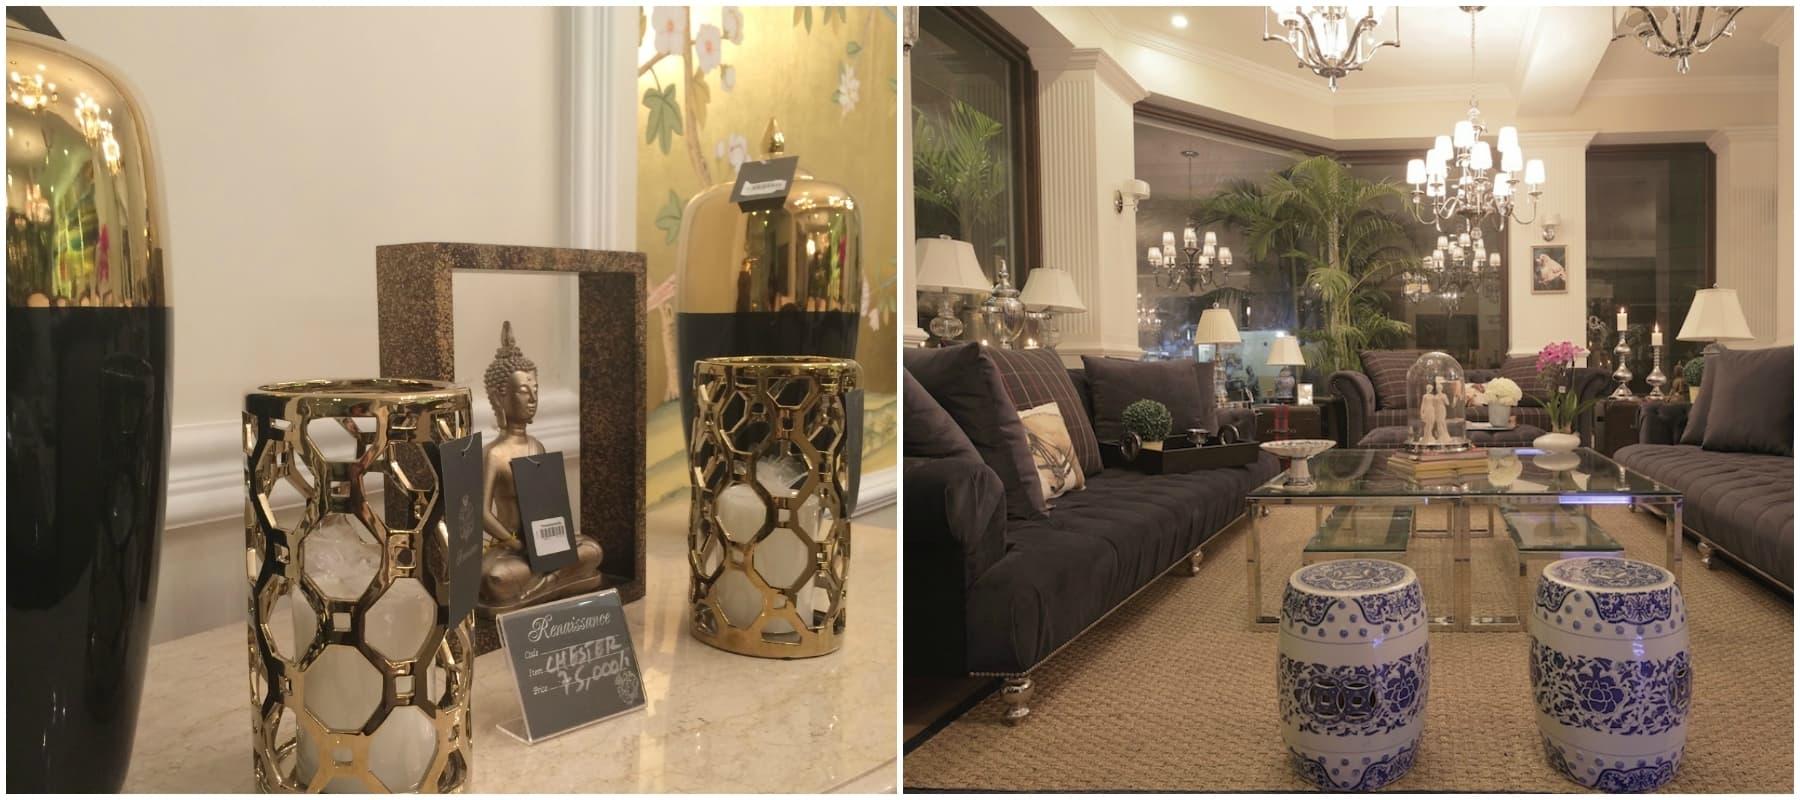 Top Picks Home Decor 10 Stores Interiors